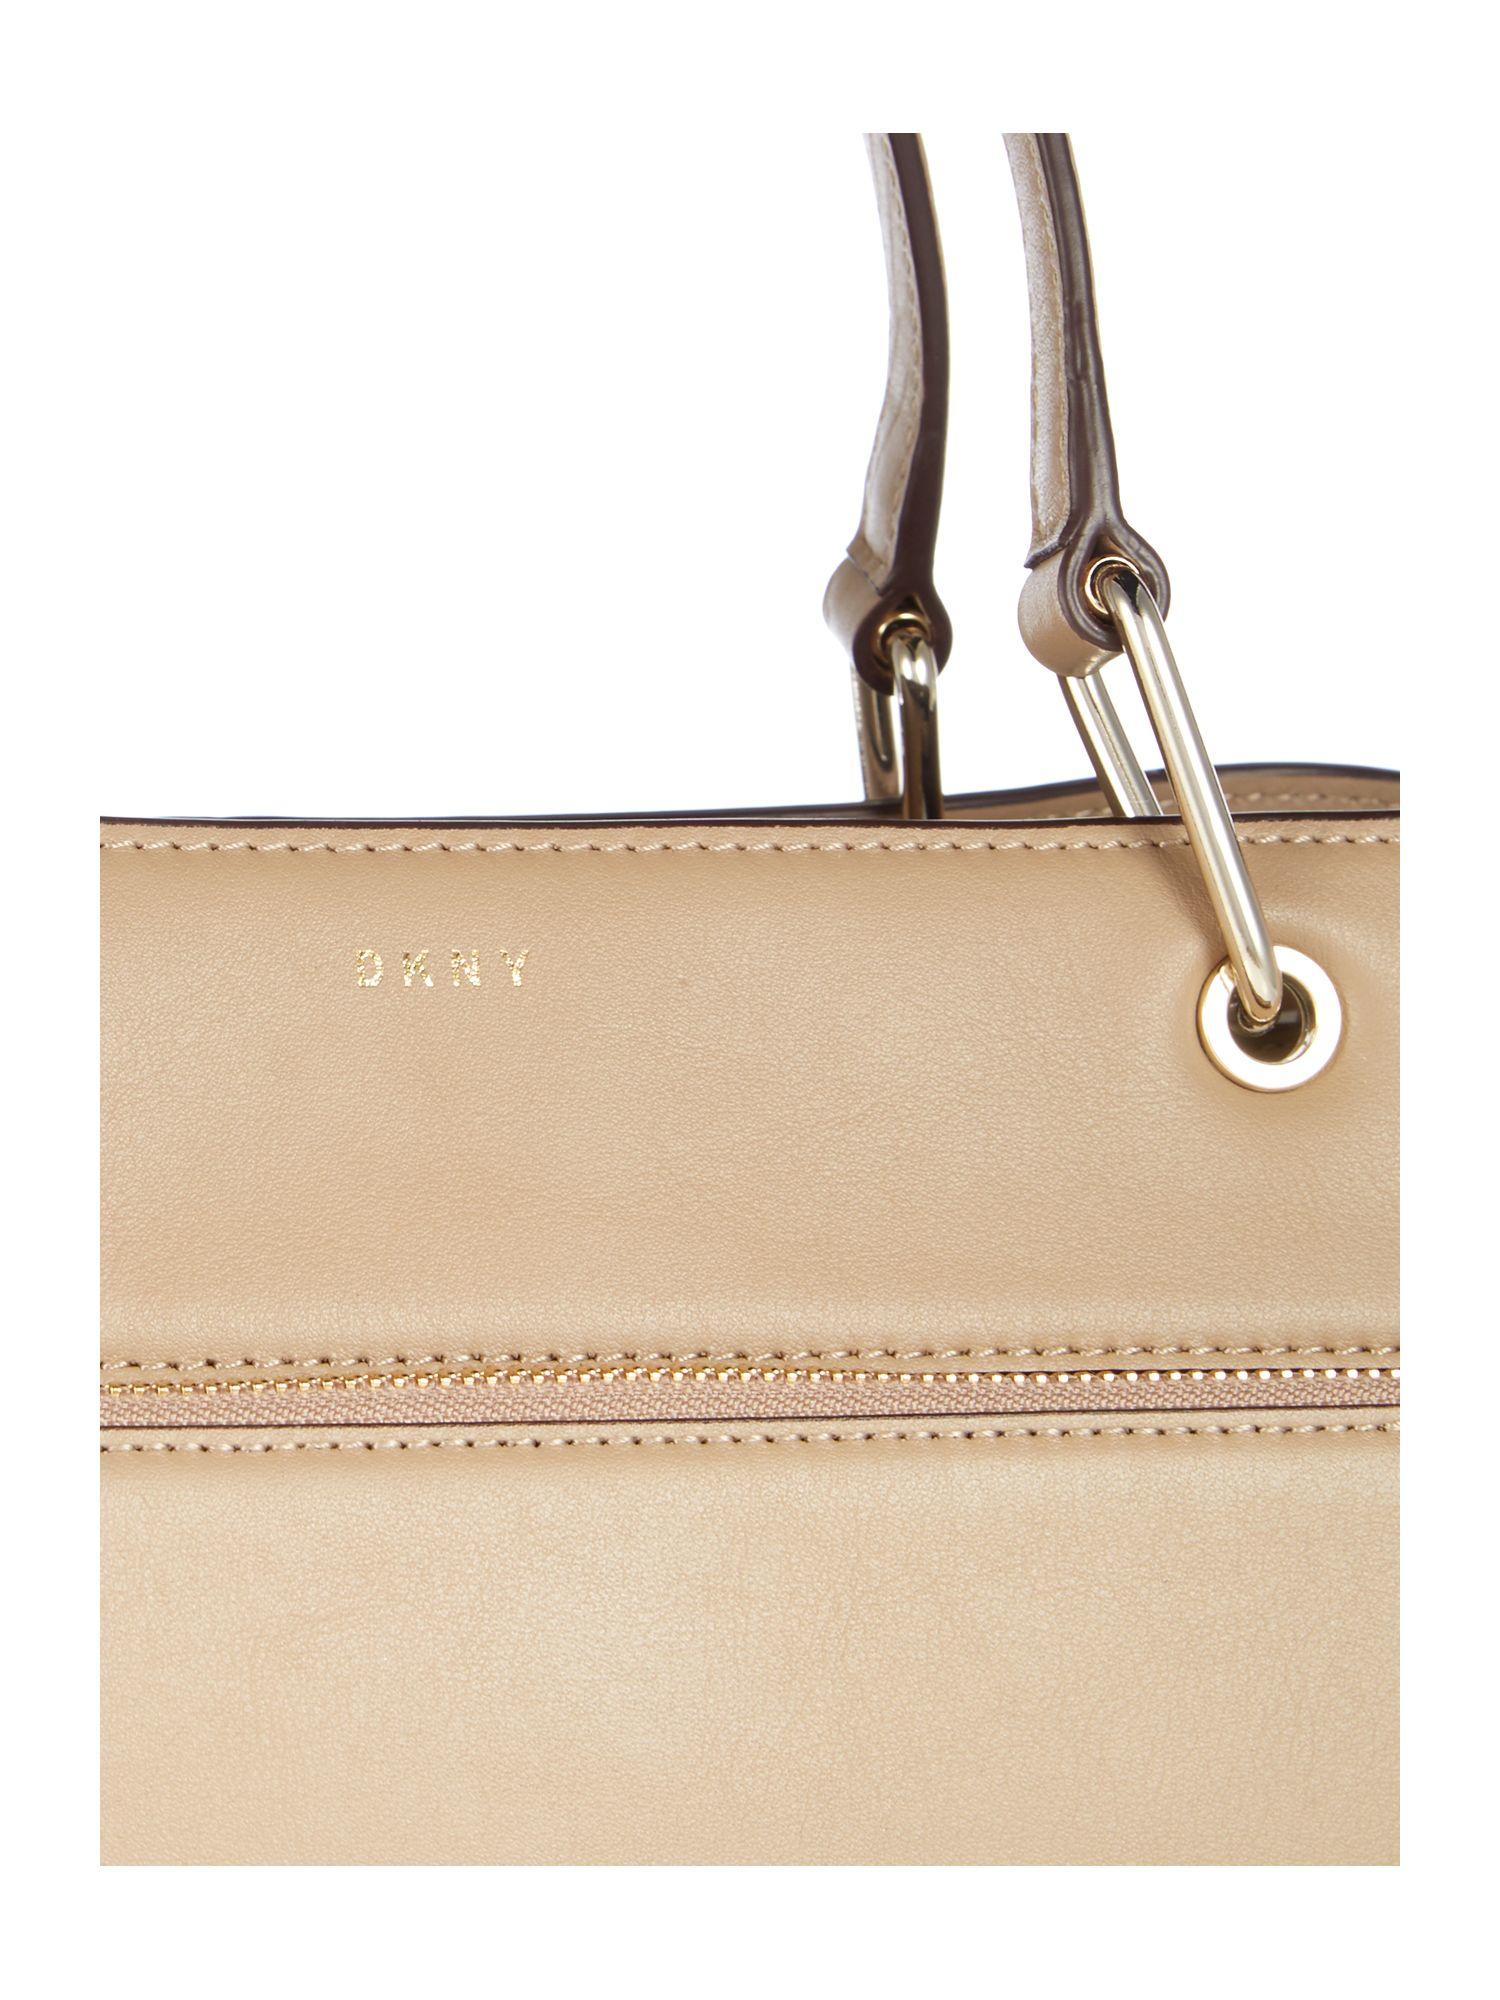 DKNY Leather Greenwich Neutral Medium Pocket Tote Bag